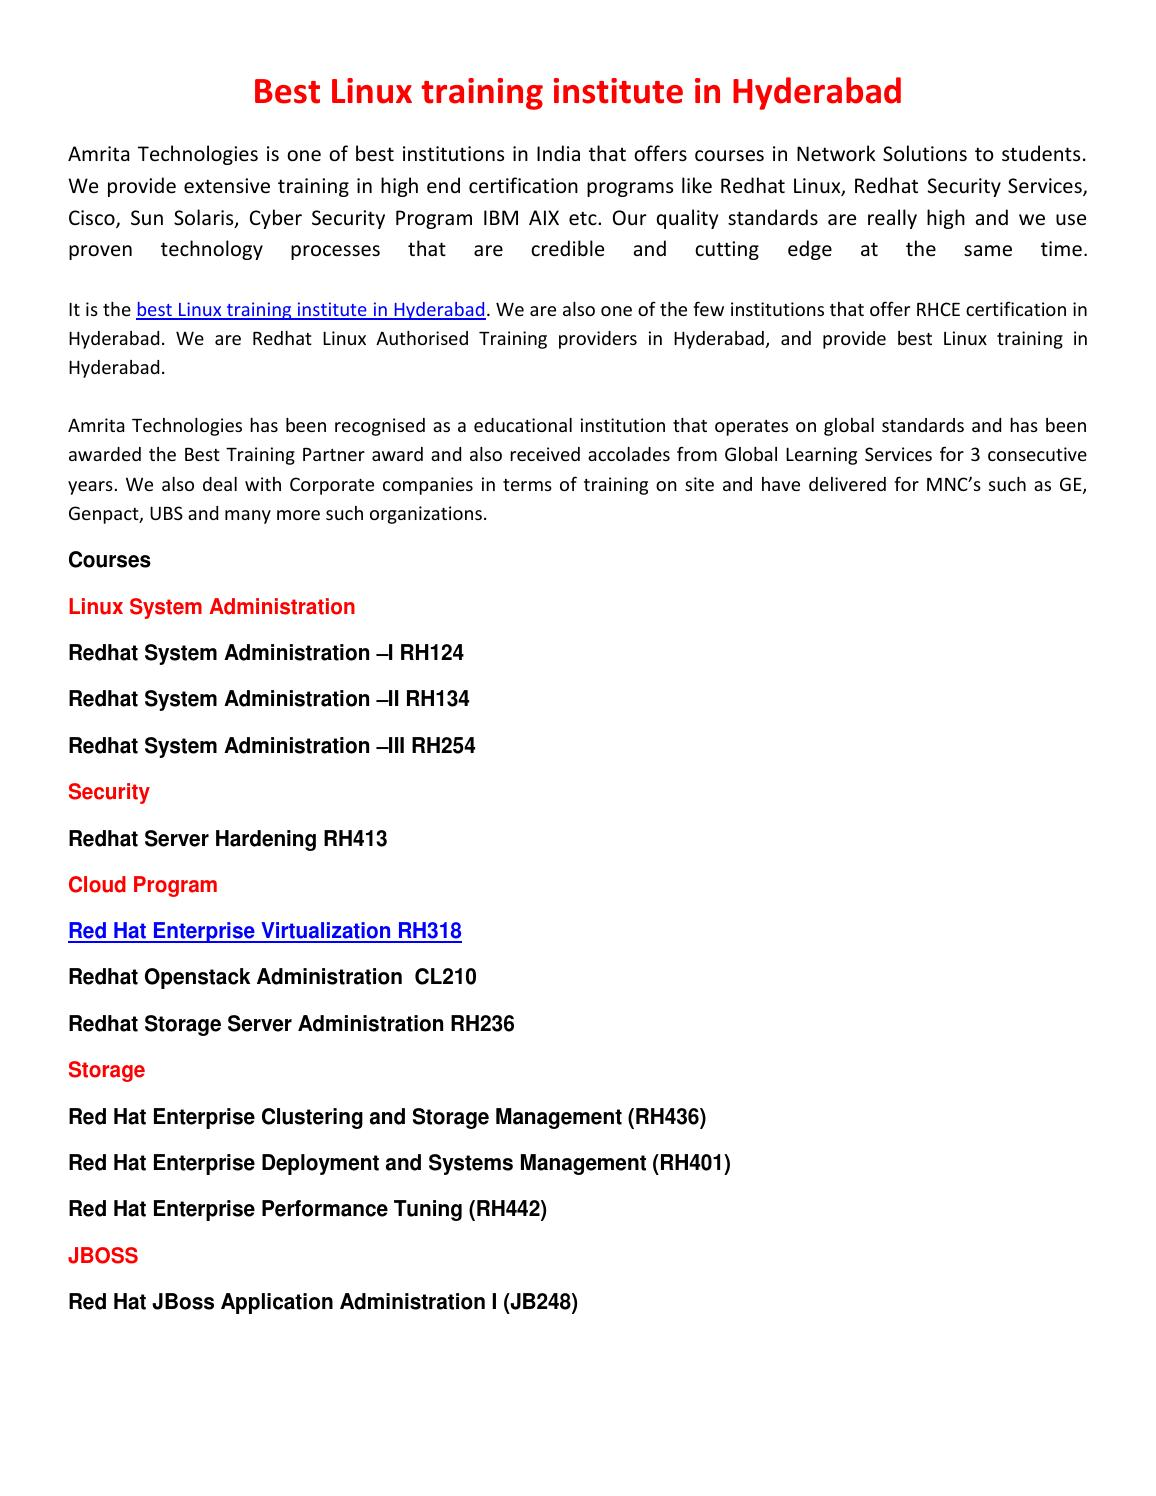 Best linux training institute in hyderabad by Amrita